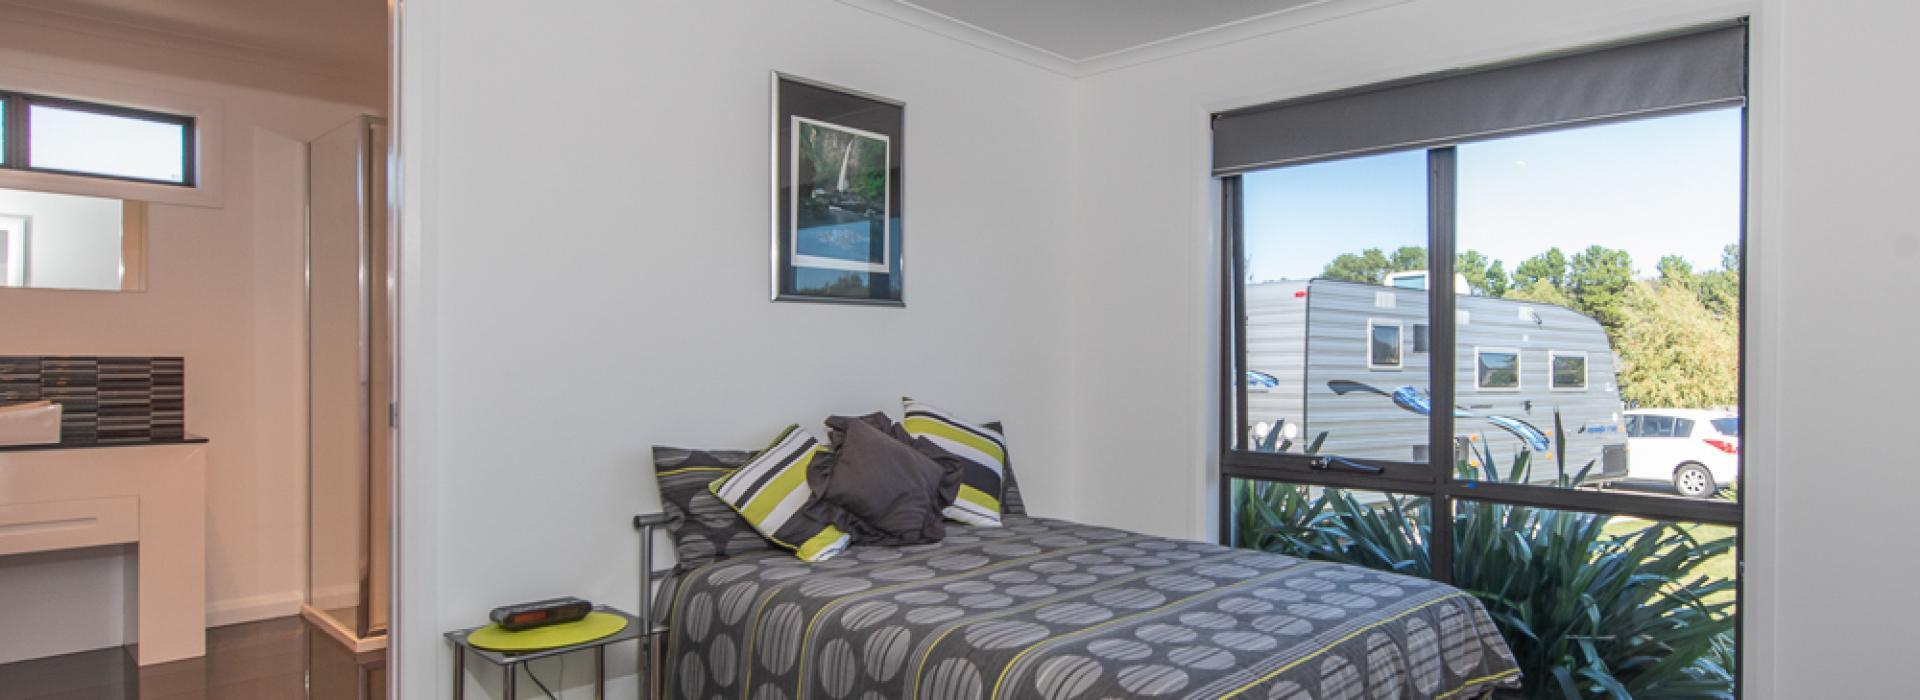 Flanagan Residential | Paul Flanagan | Property Sales | Riverside